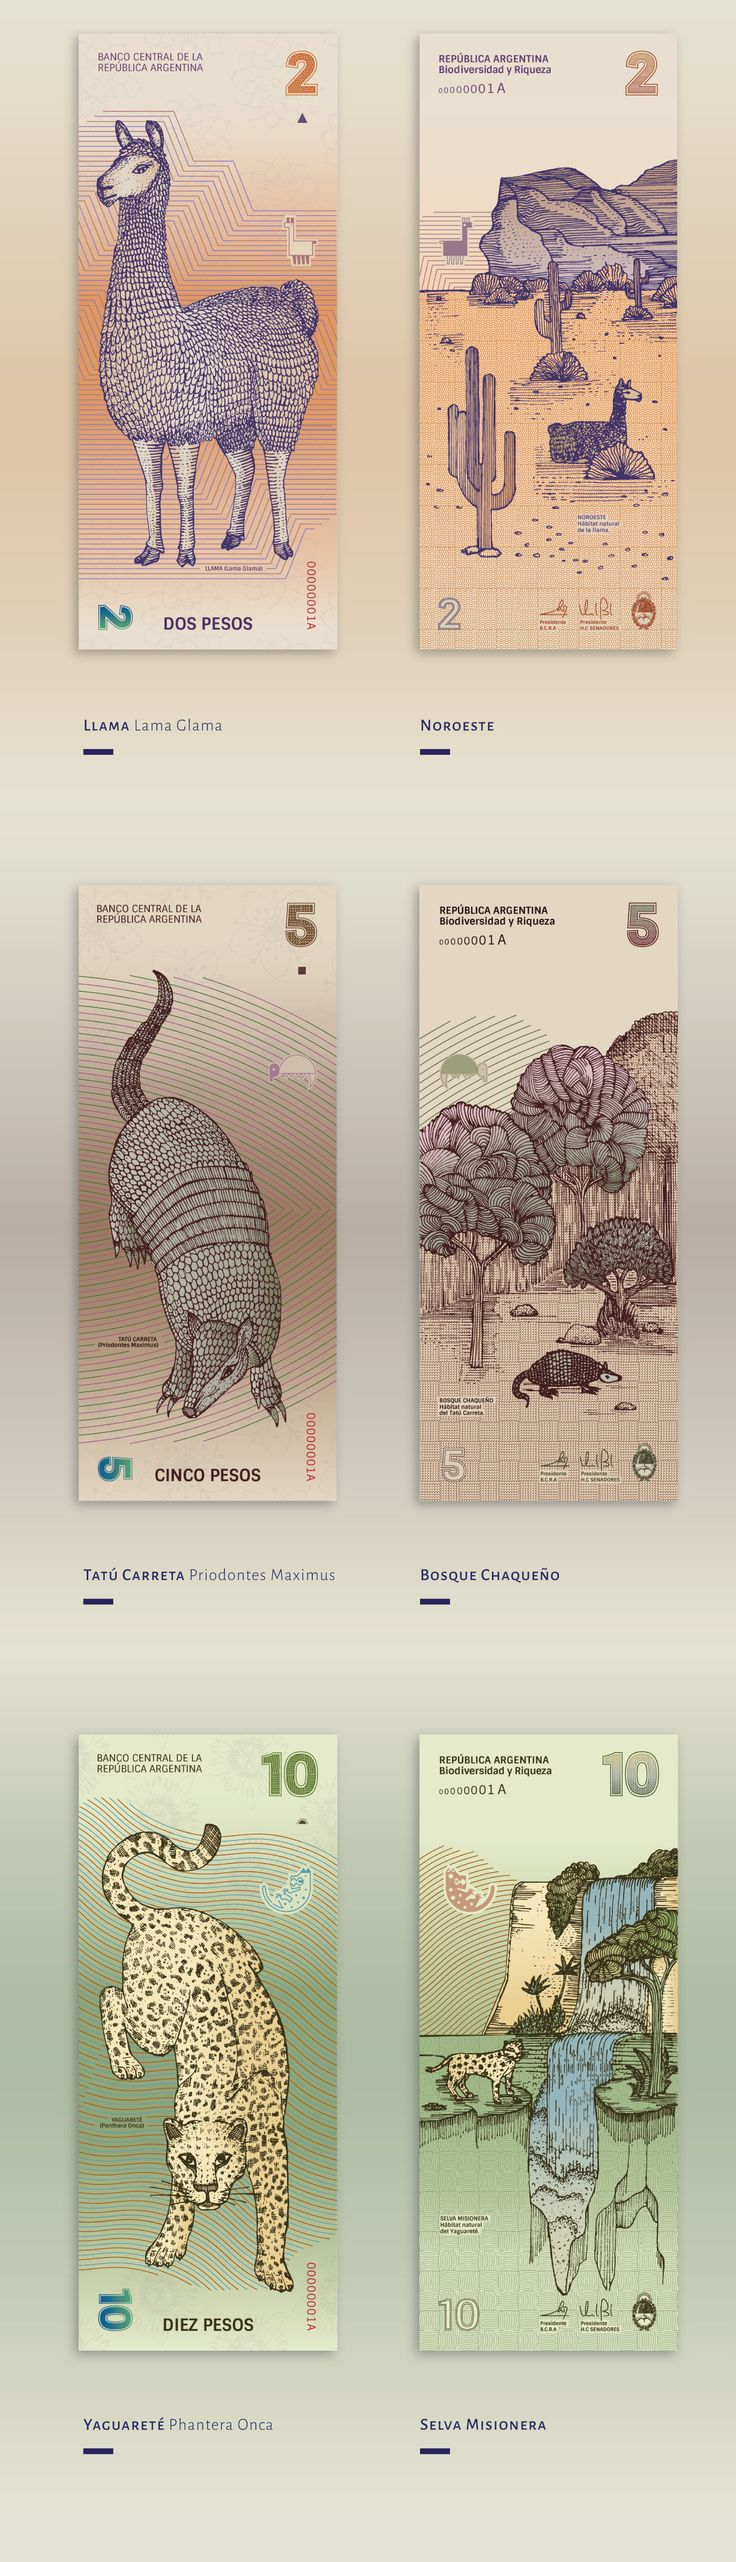 https://www.behance.net/gallery/32123521/Rediseno-Papel-Moneda-Argentino